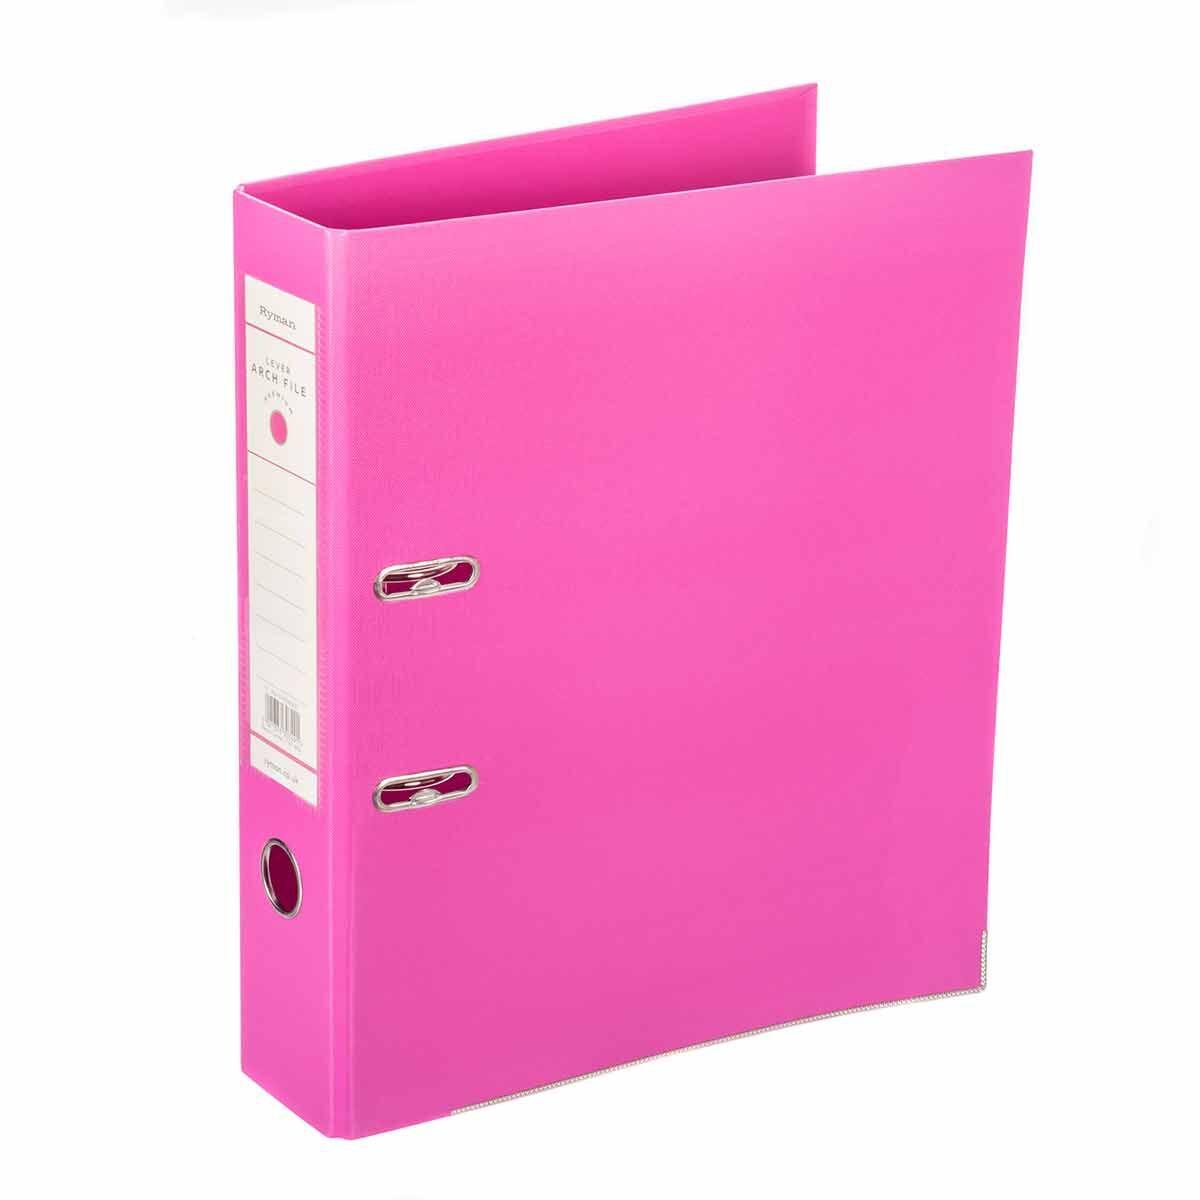 Ryman Premium Lever Arch File Foolscap Pink